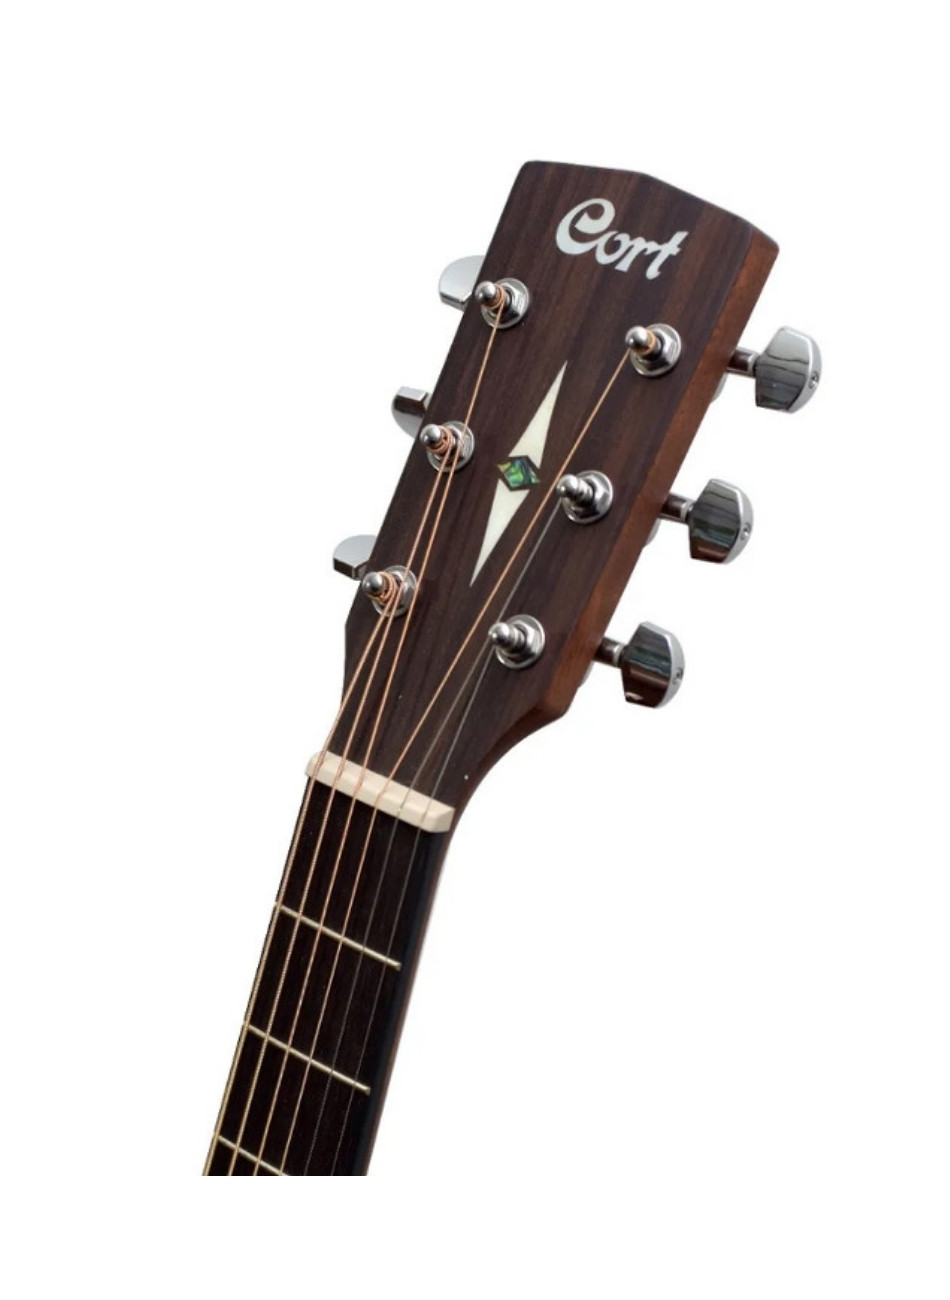 Violão Cort Mr500e Folk Elétrico Aço Vintage Burst LVBS